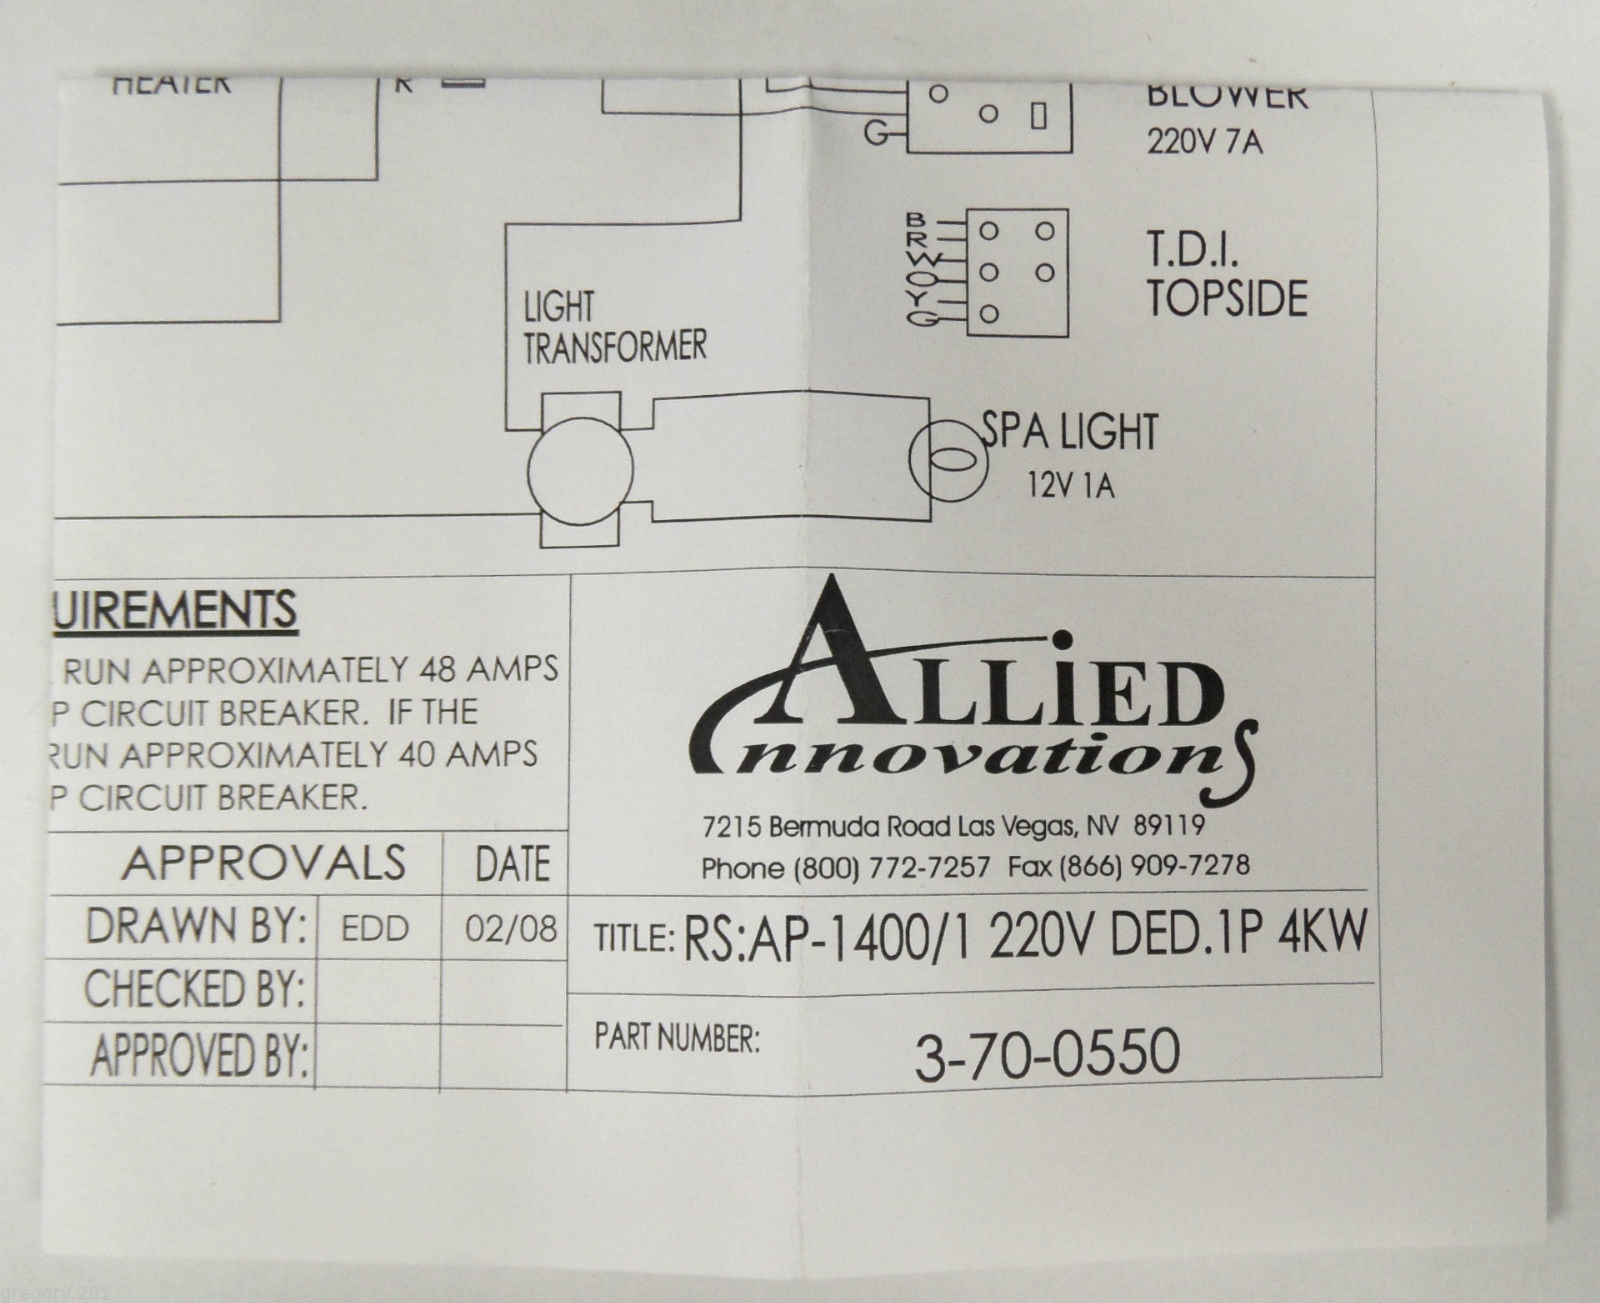 hight resolution of bermuda spa wiring diagram schema wiring diagramsallied innovations 3 70 0550 wiring diagram ap 1400 rs